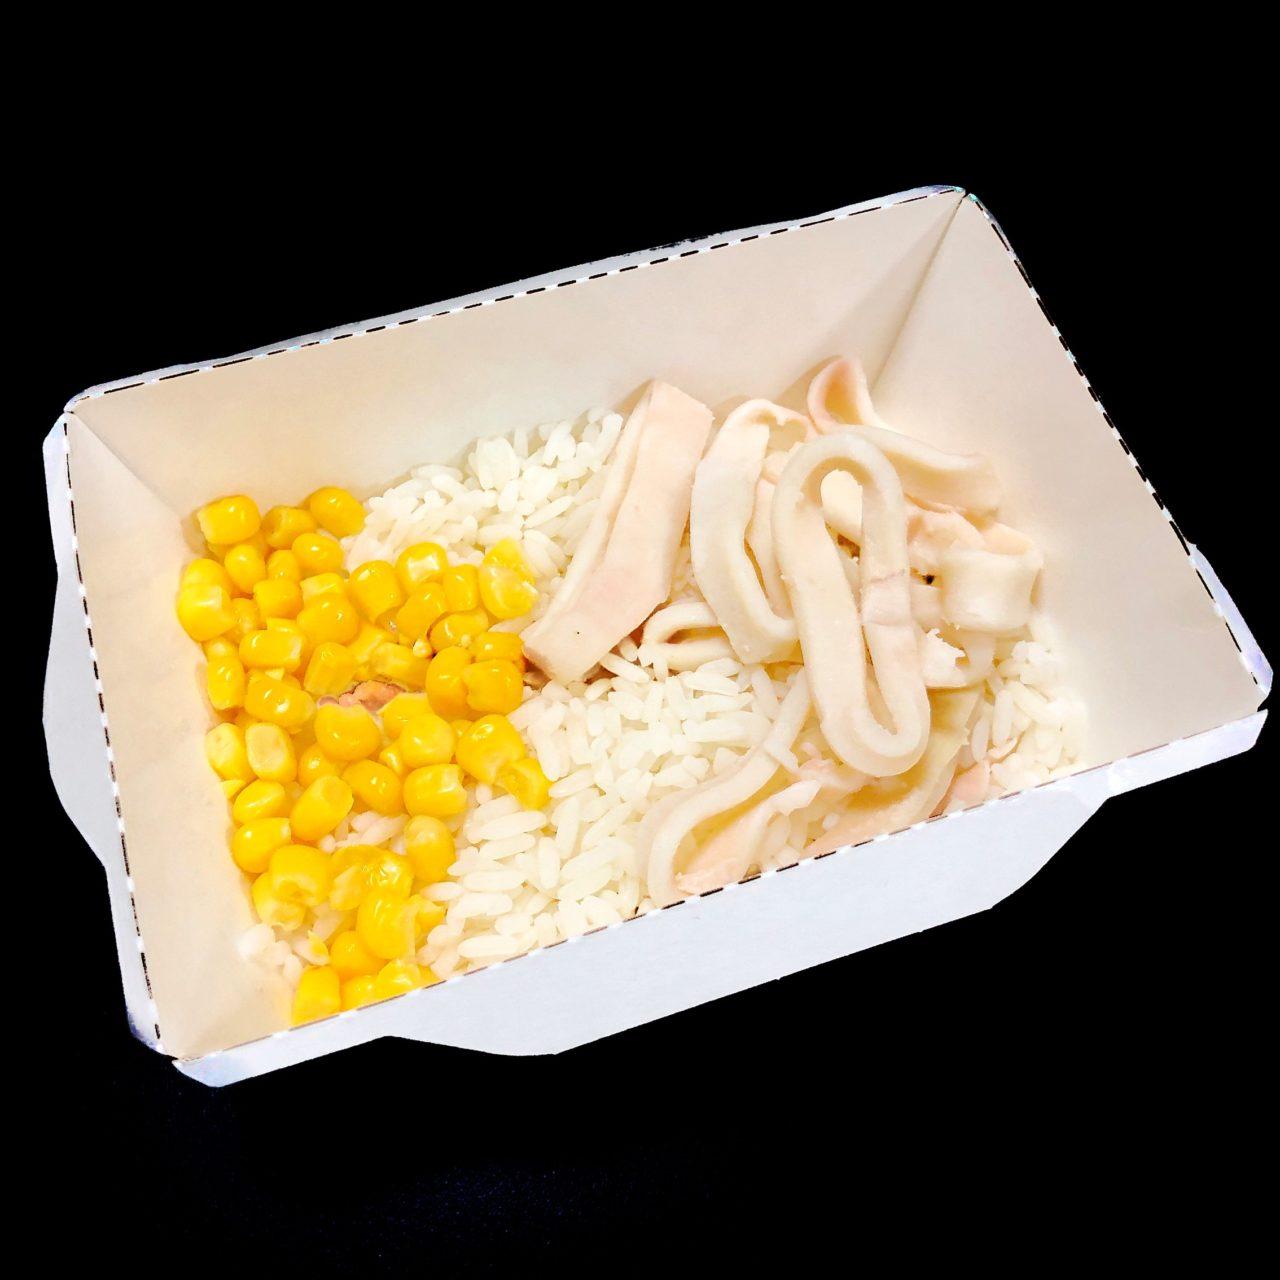 Кальмары с рисом и кукурузой